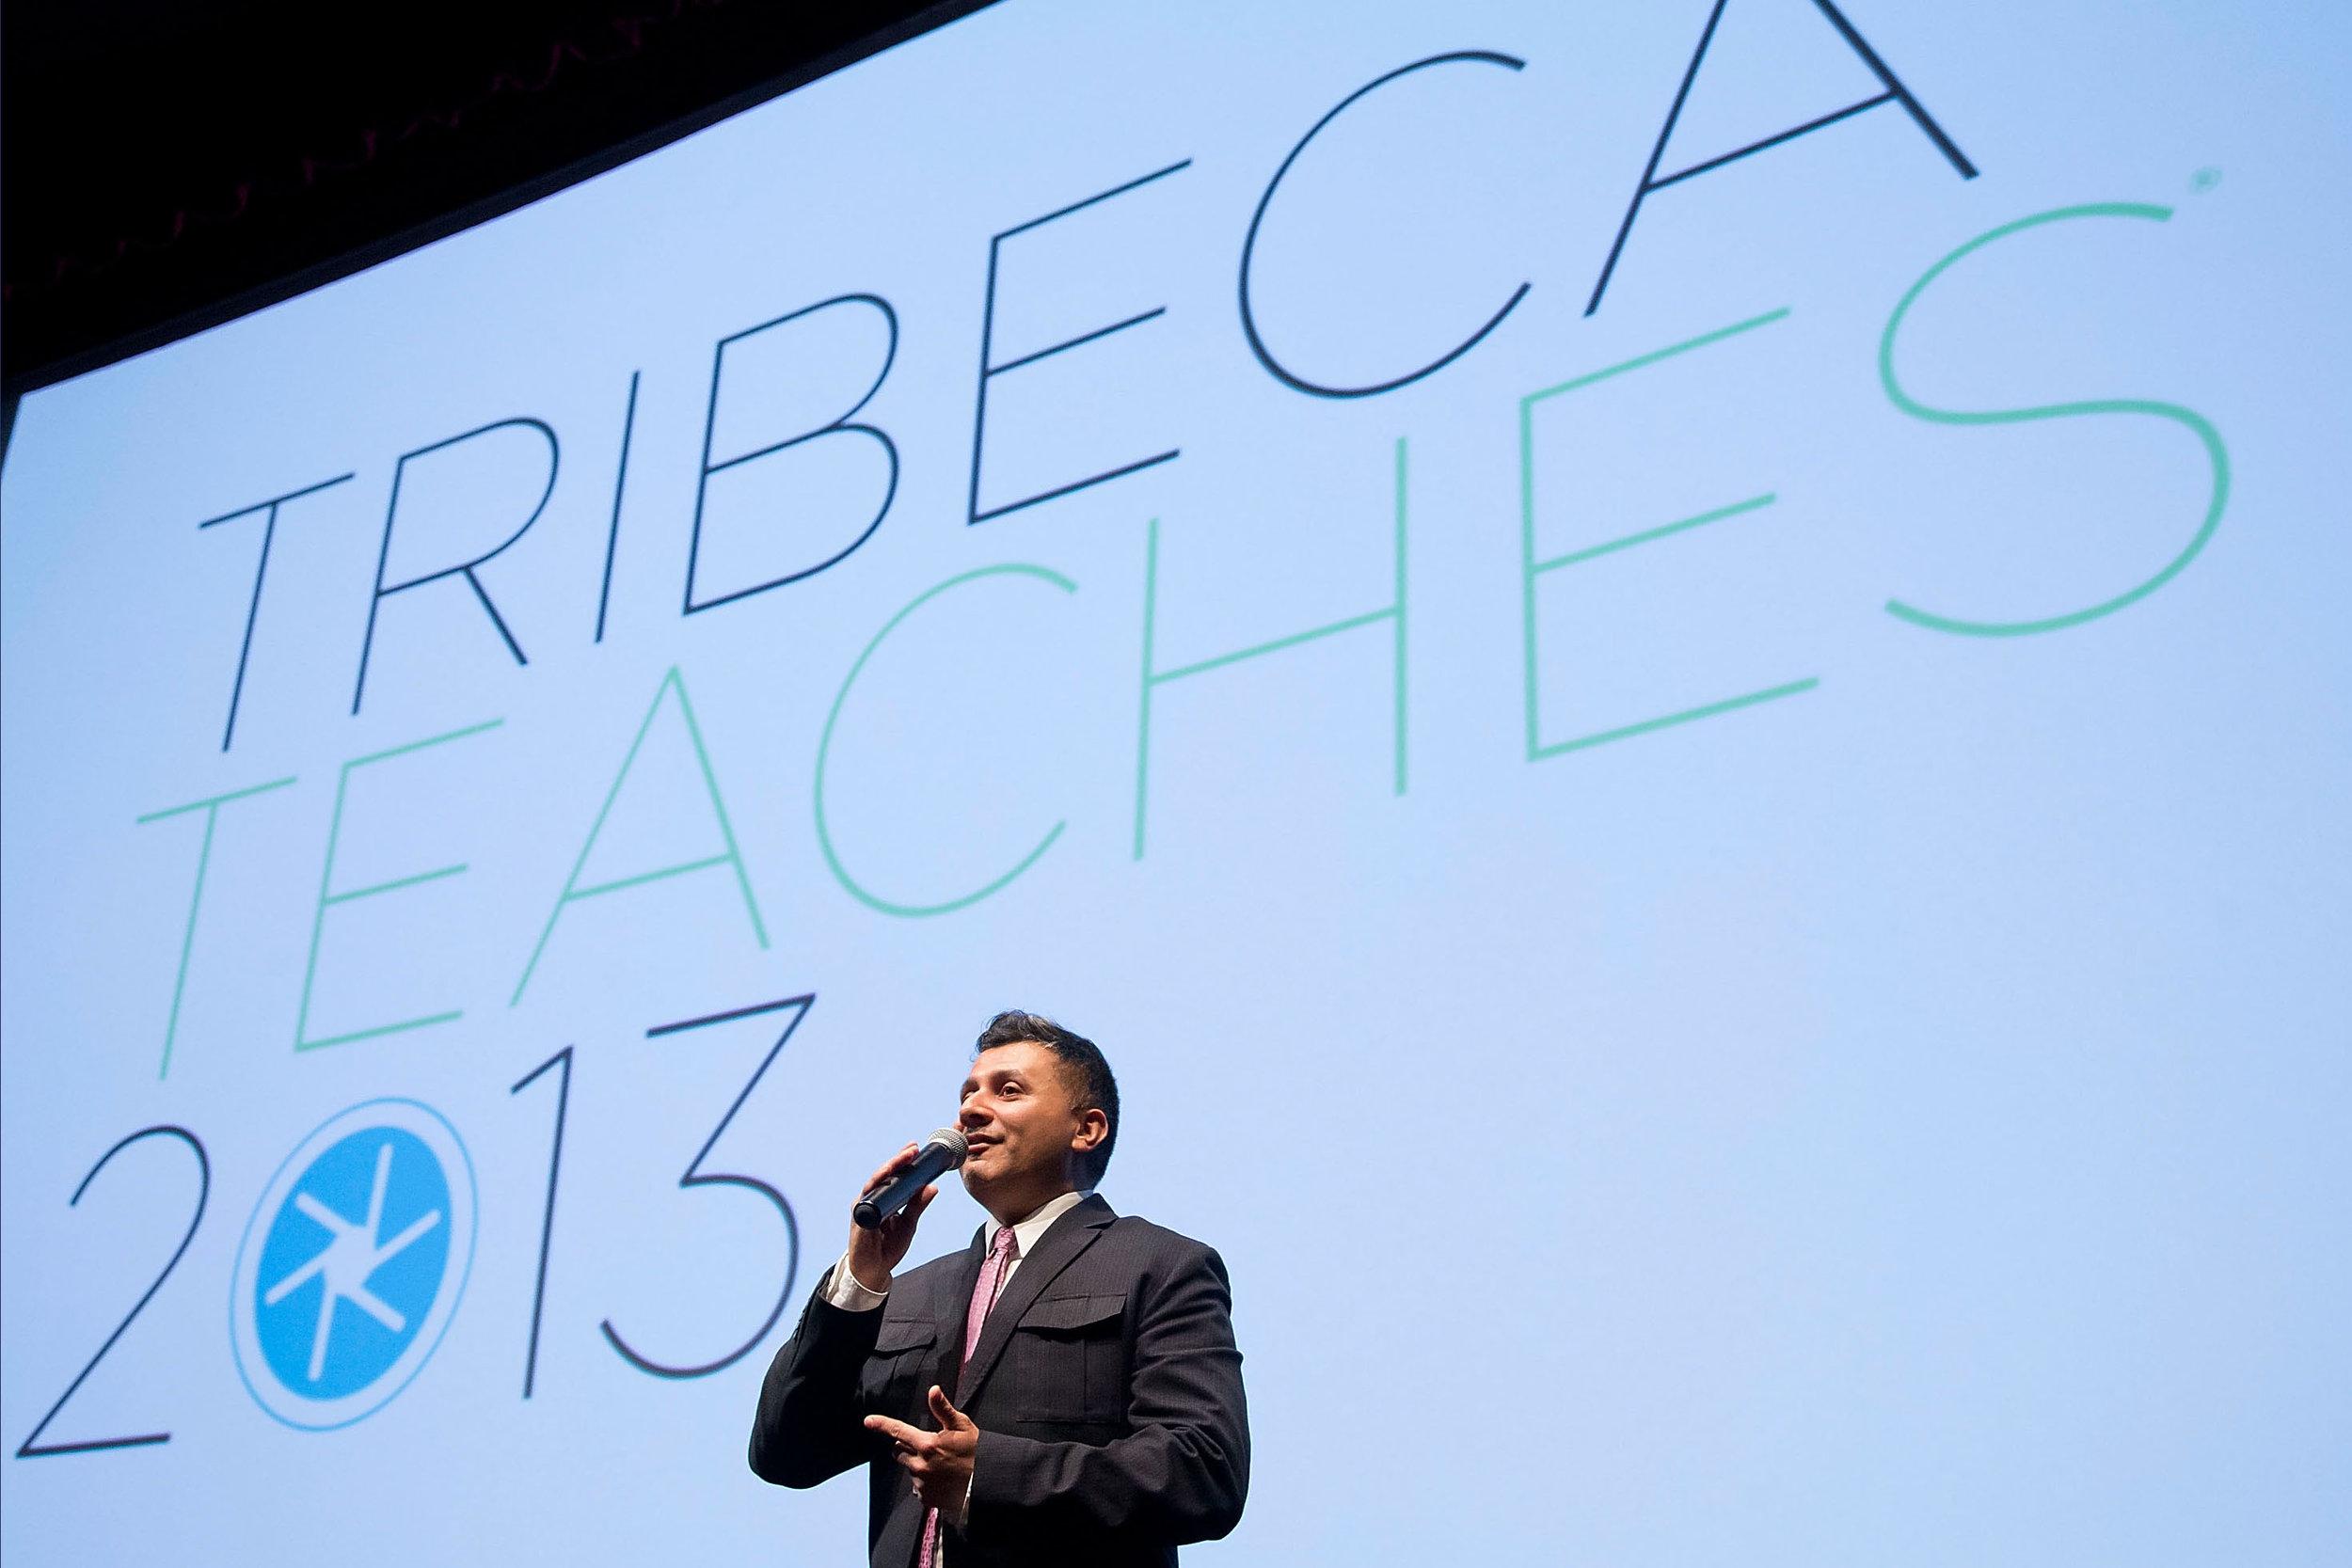 Tribeca Teaches @ SVA Theater